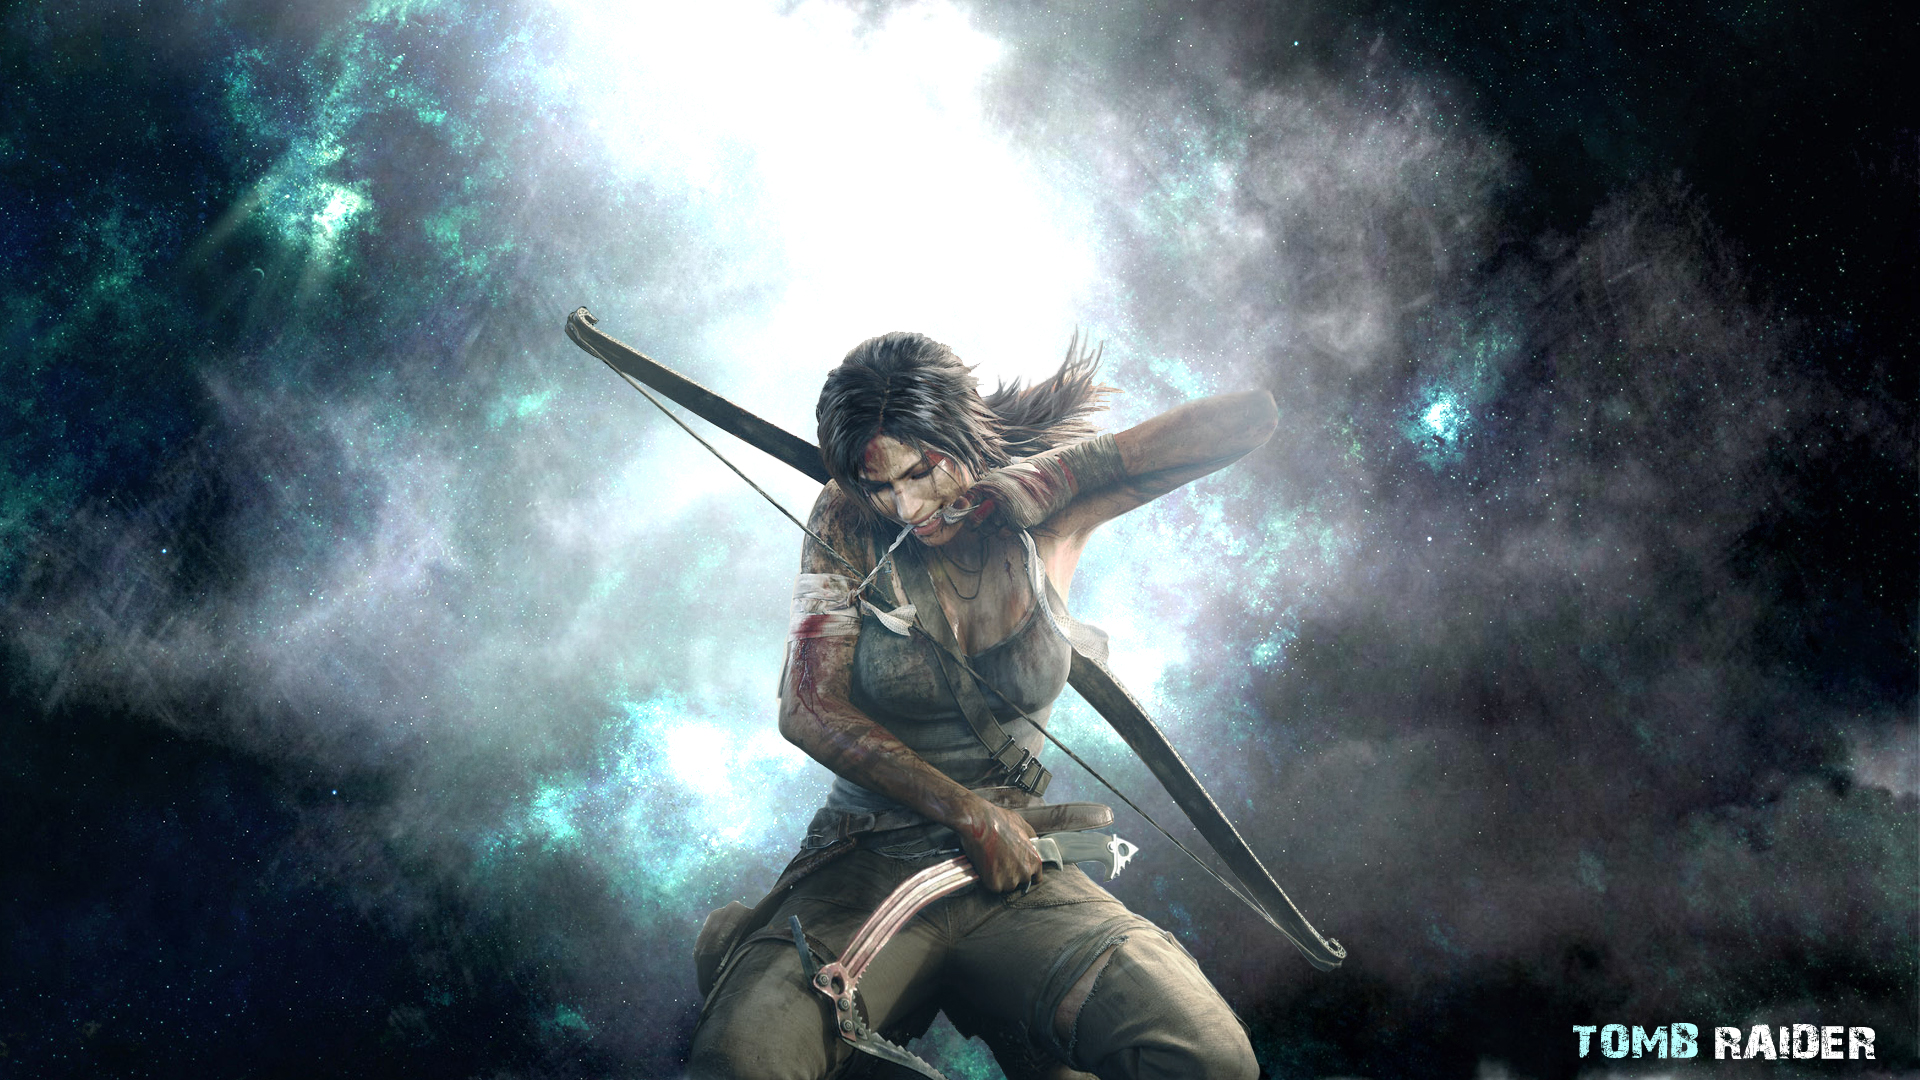 Lara Croft Tomb Raider By Andynroses On Deviantart